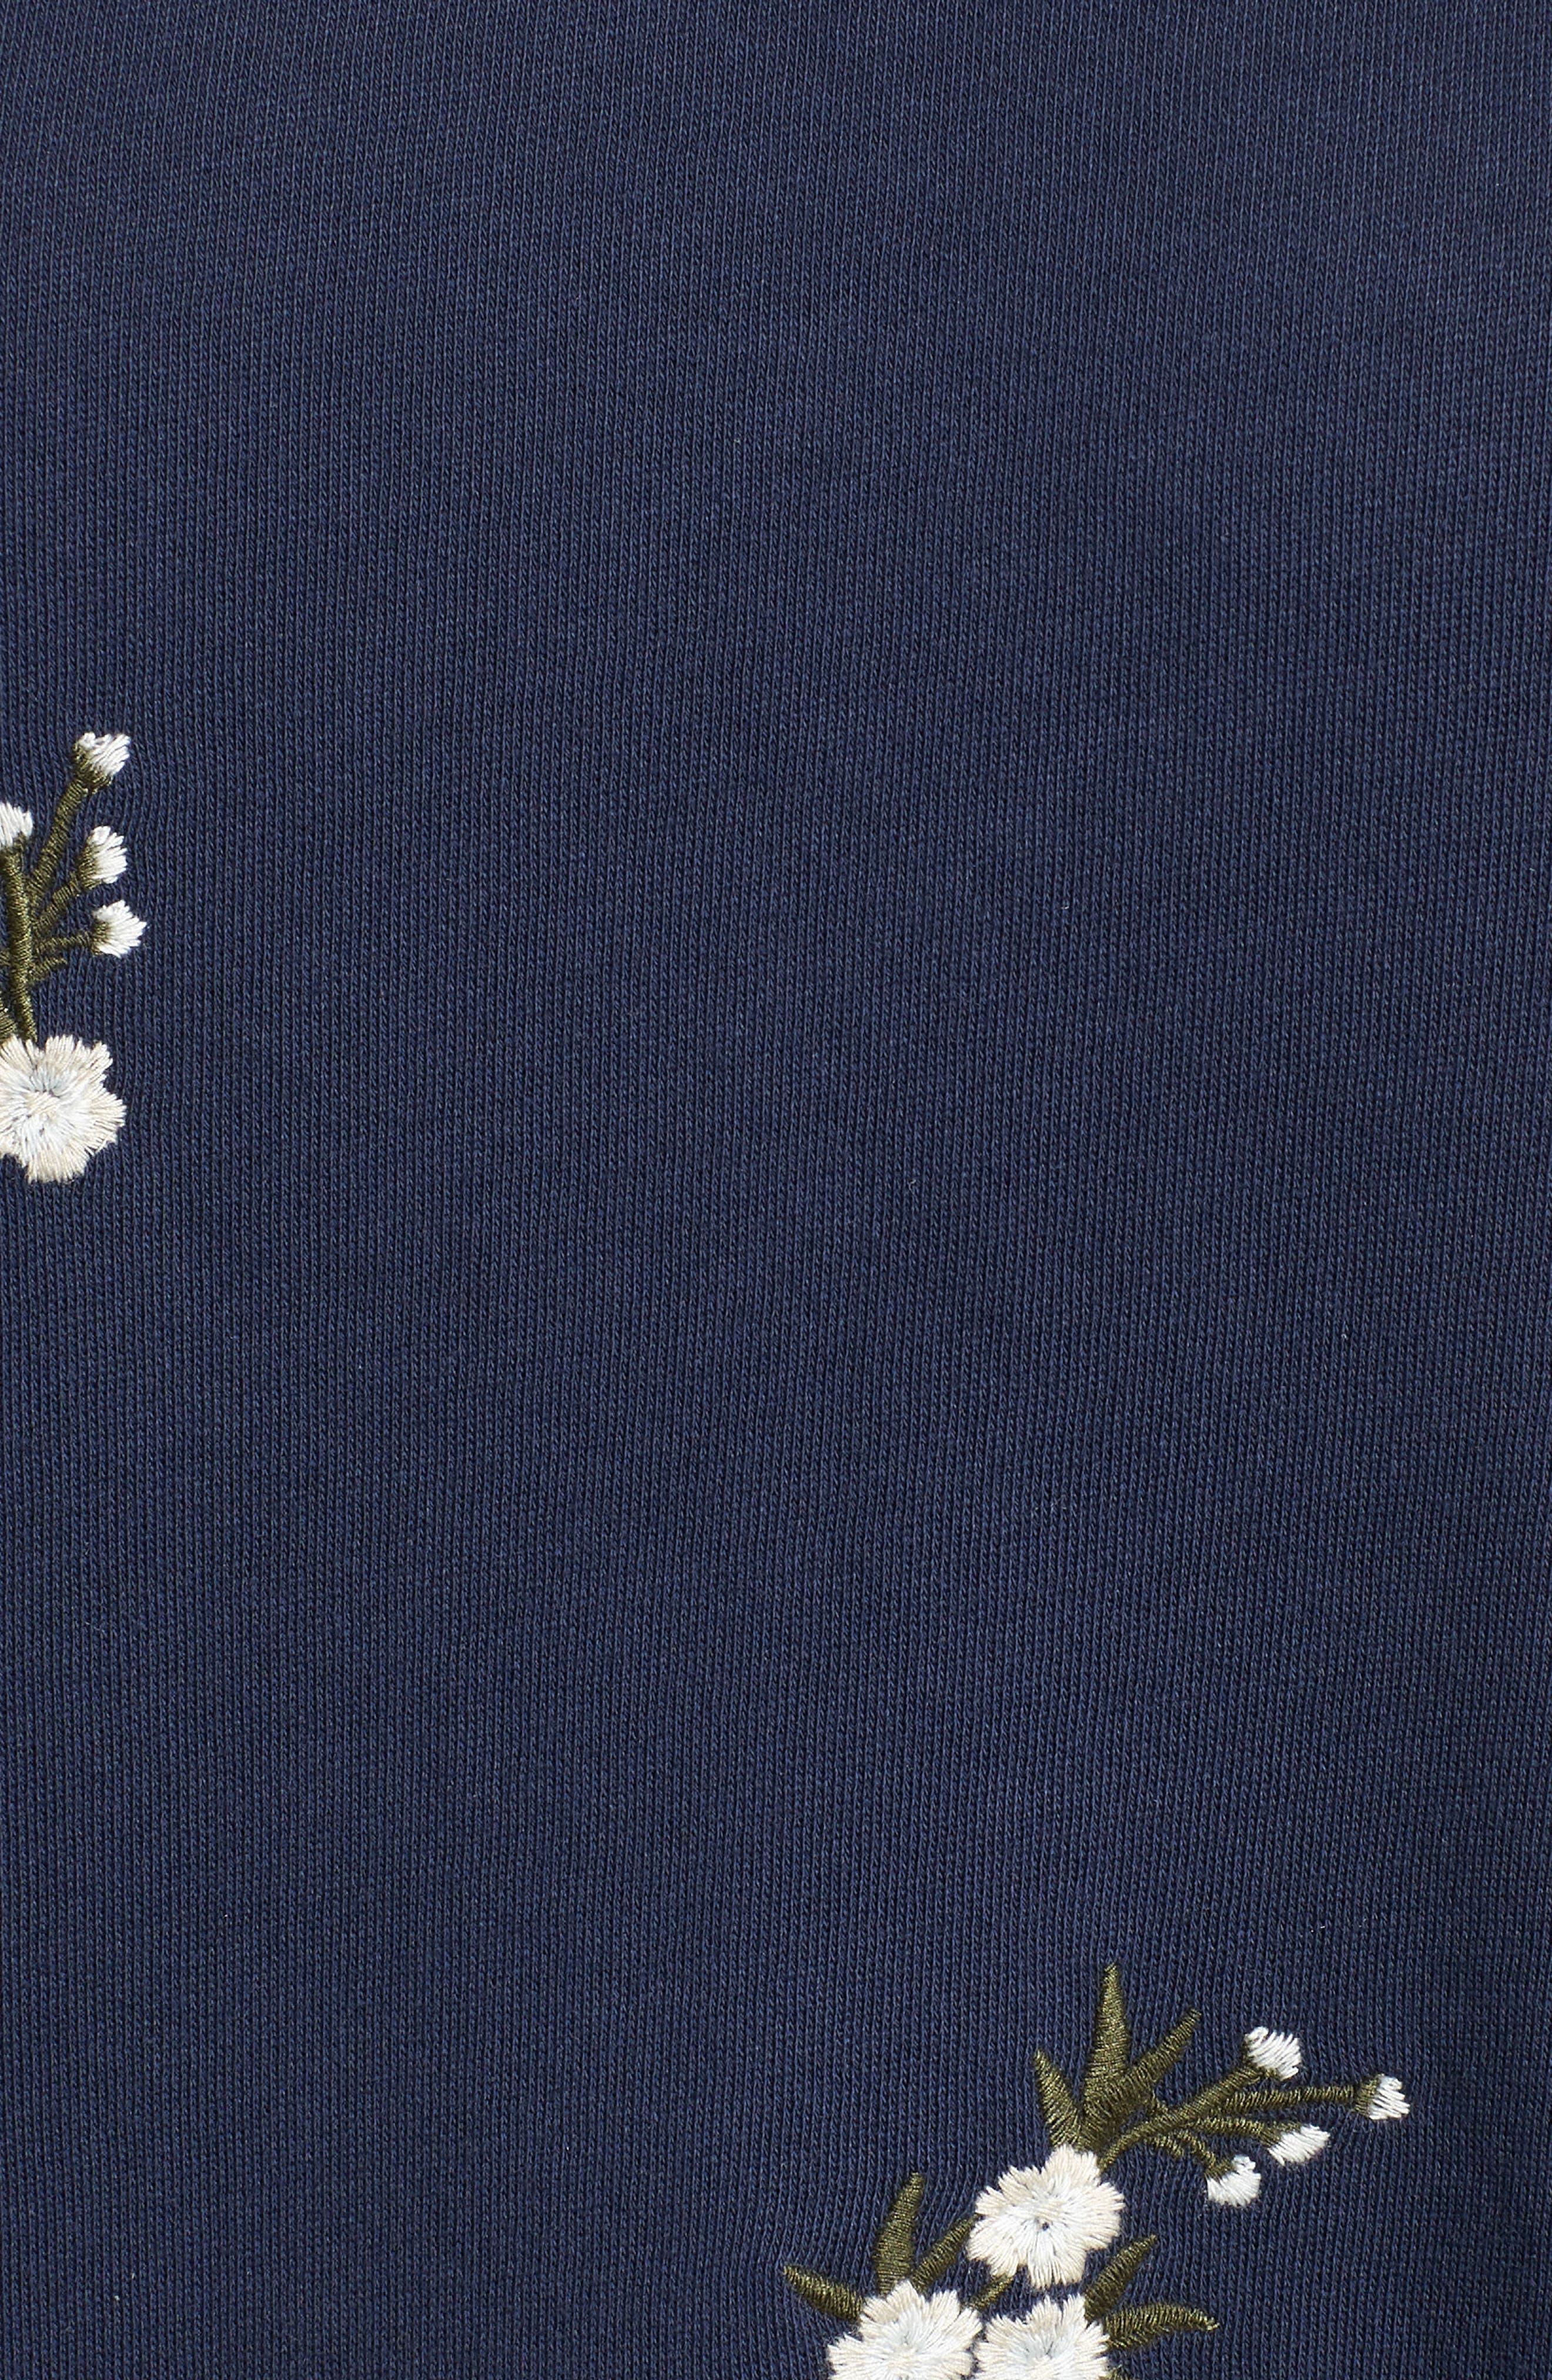 Embroidered Sweatshirt Dress,                             Alternate thumbnail 6, color,                             NAVY INDIGO GAYLE EMB